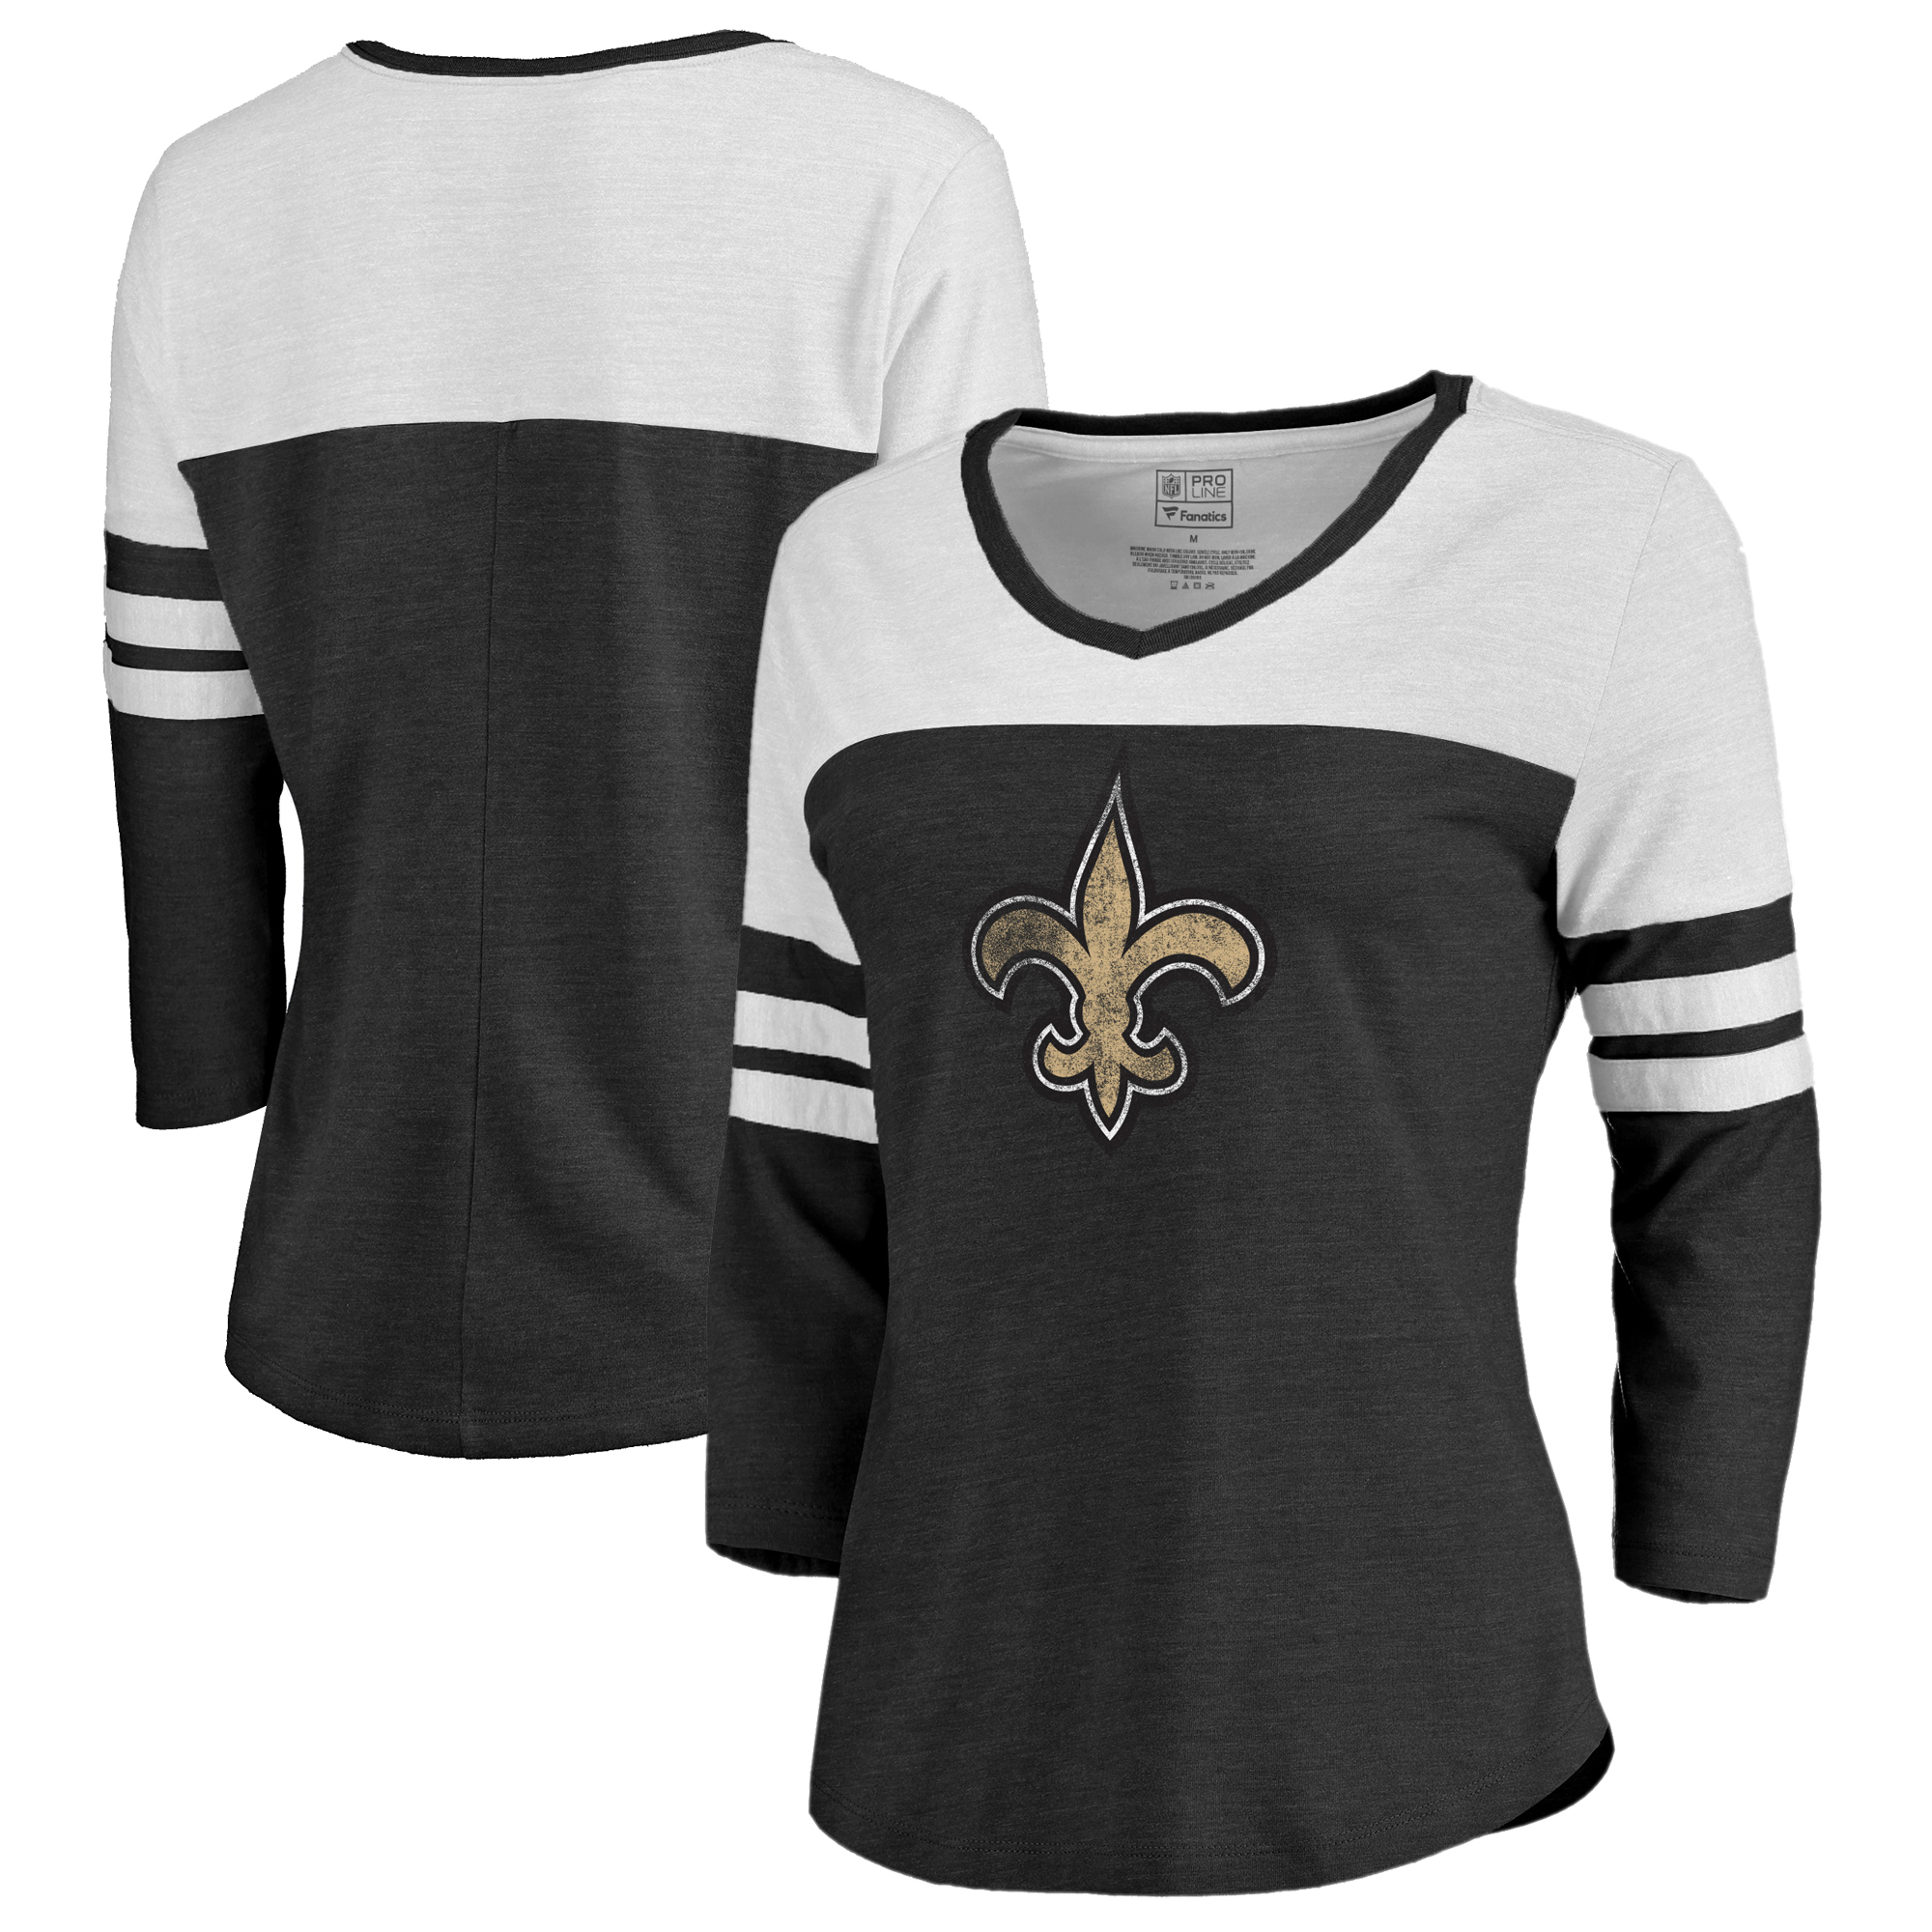 New Orleans Saints NFL Pro Line by Fanatics Branded Women's Distressed Primary Logo Three-Quarter Sleeve Raglan Tri-Blend T-Shirt - Black